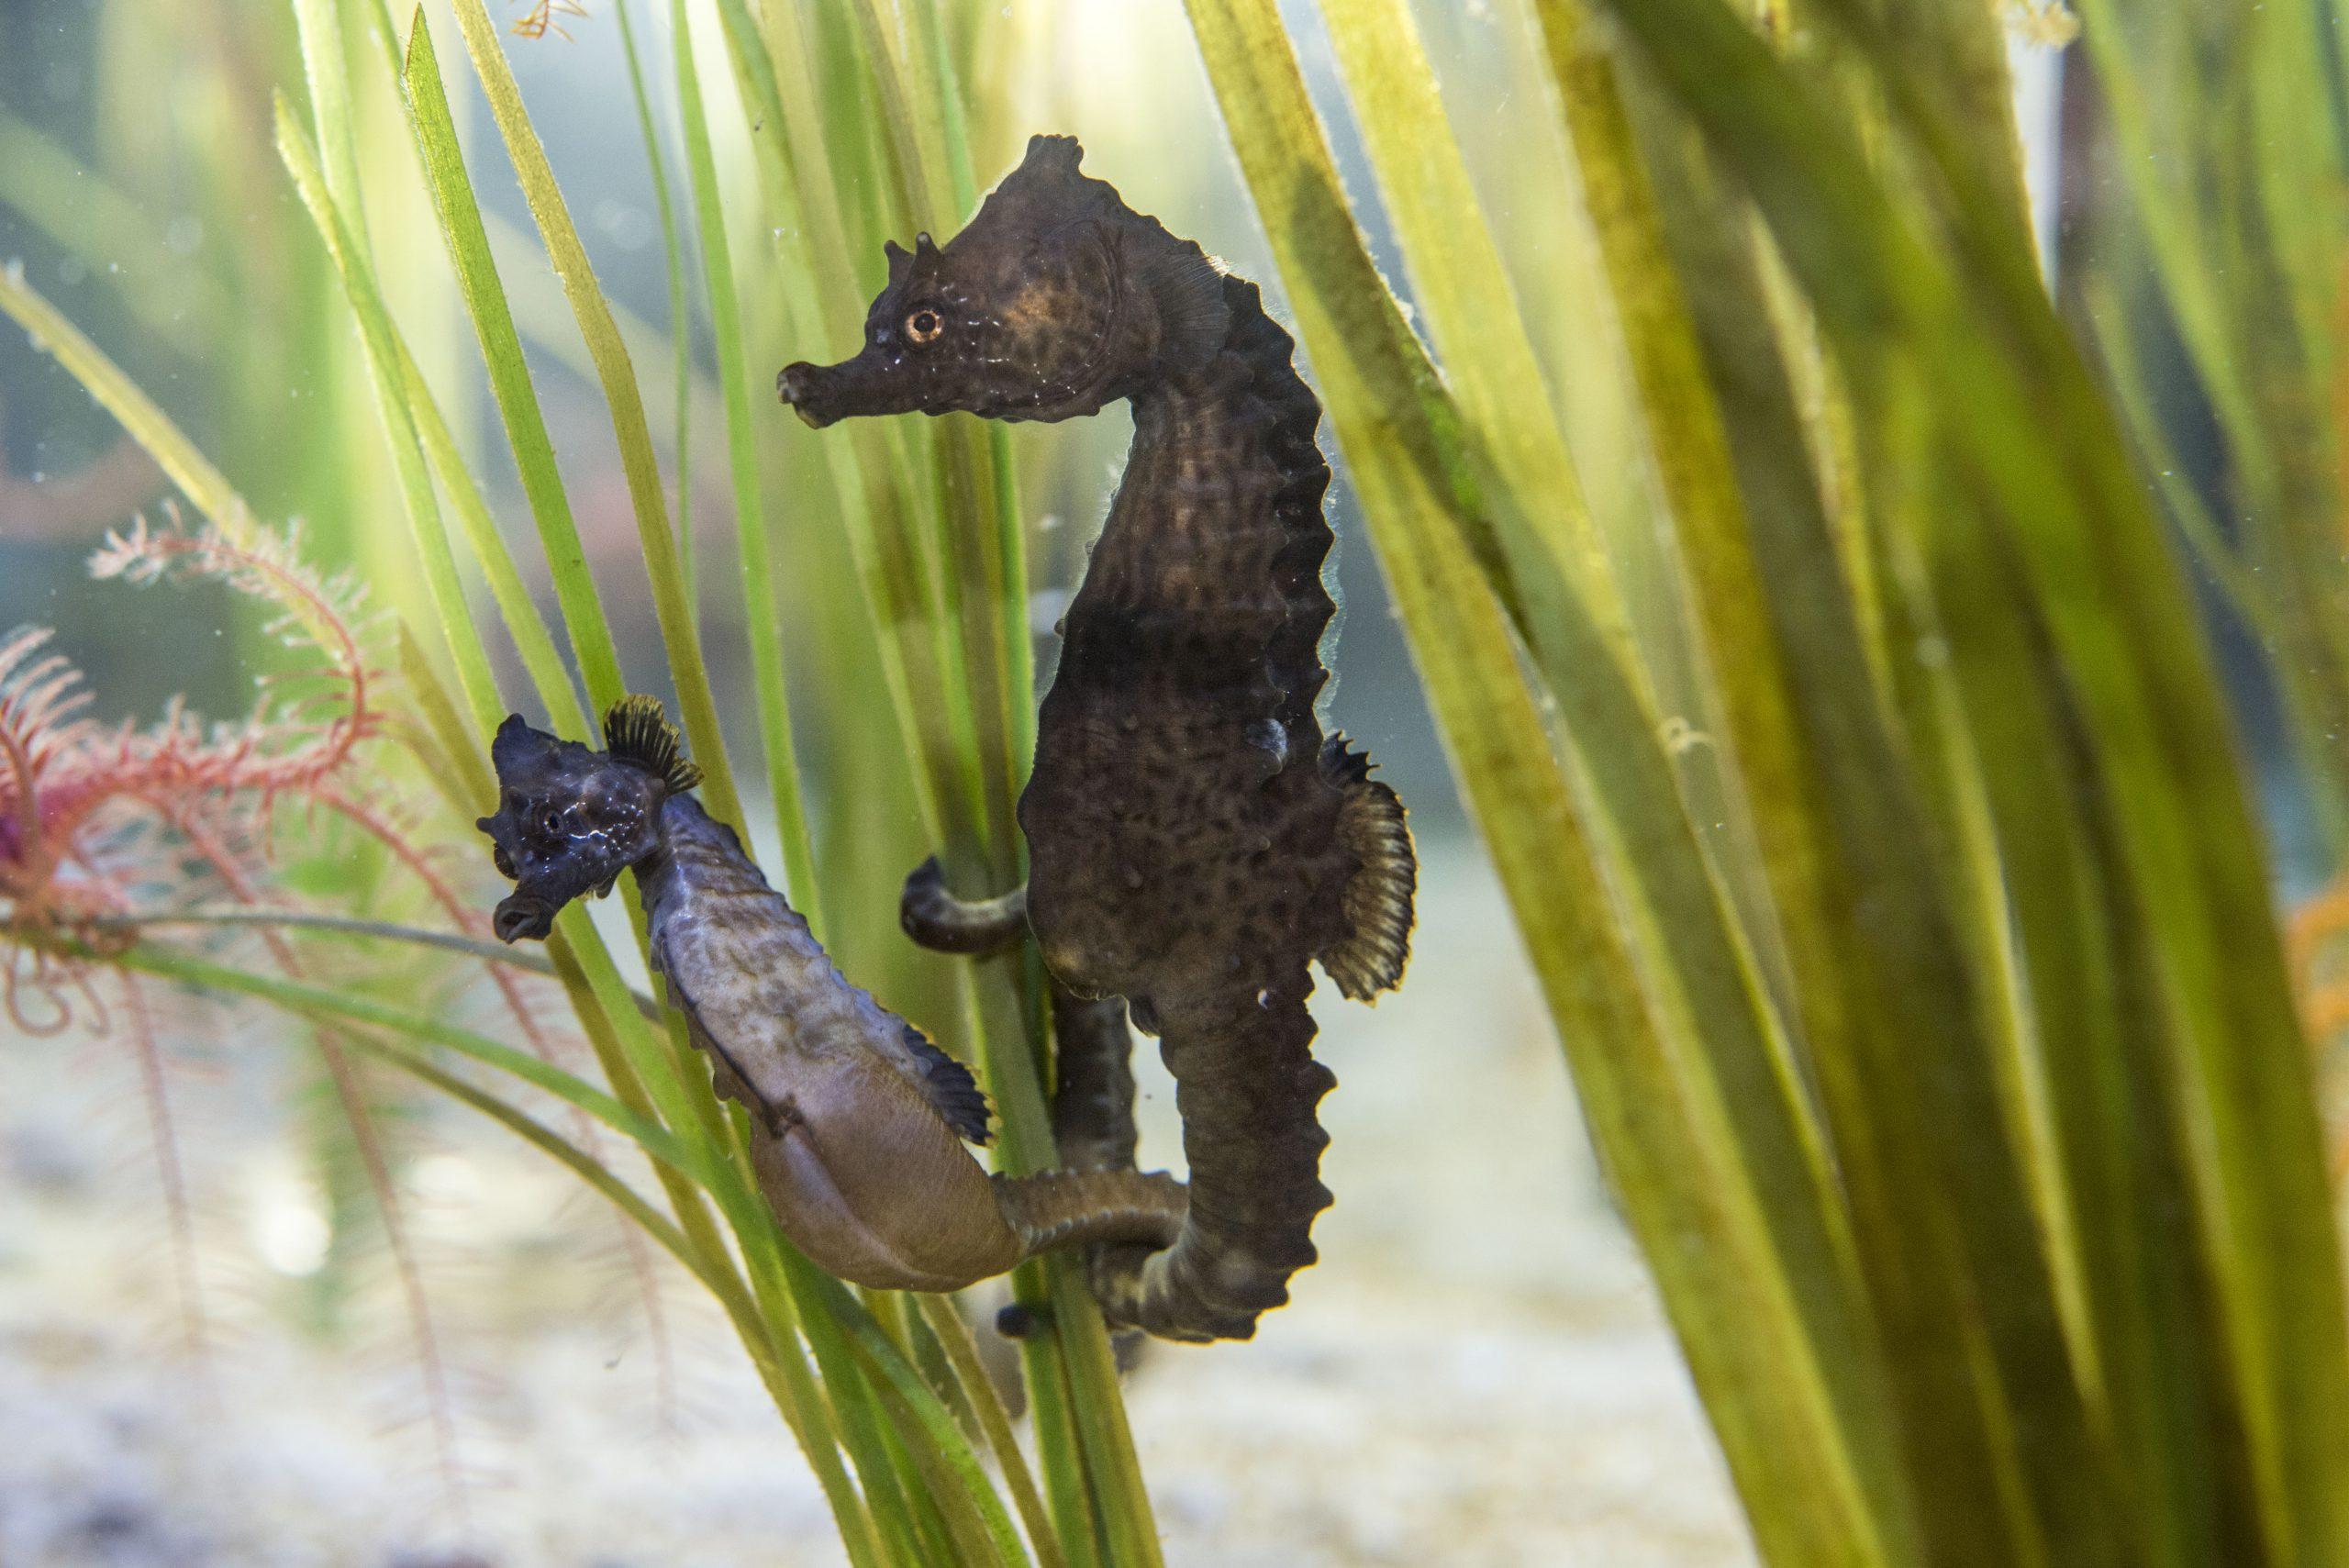 05_Hippocampe-à-museau-court-Hippocampus-hippocampus_M_Dagnino